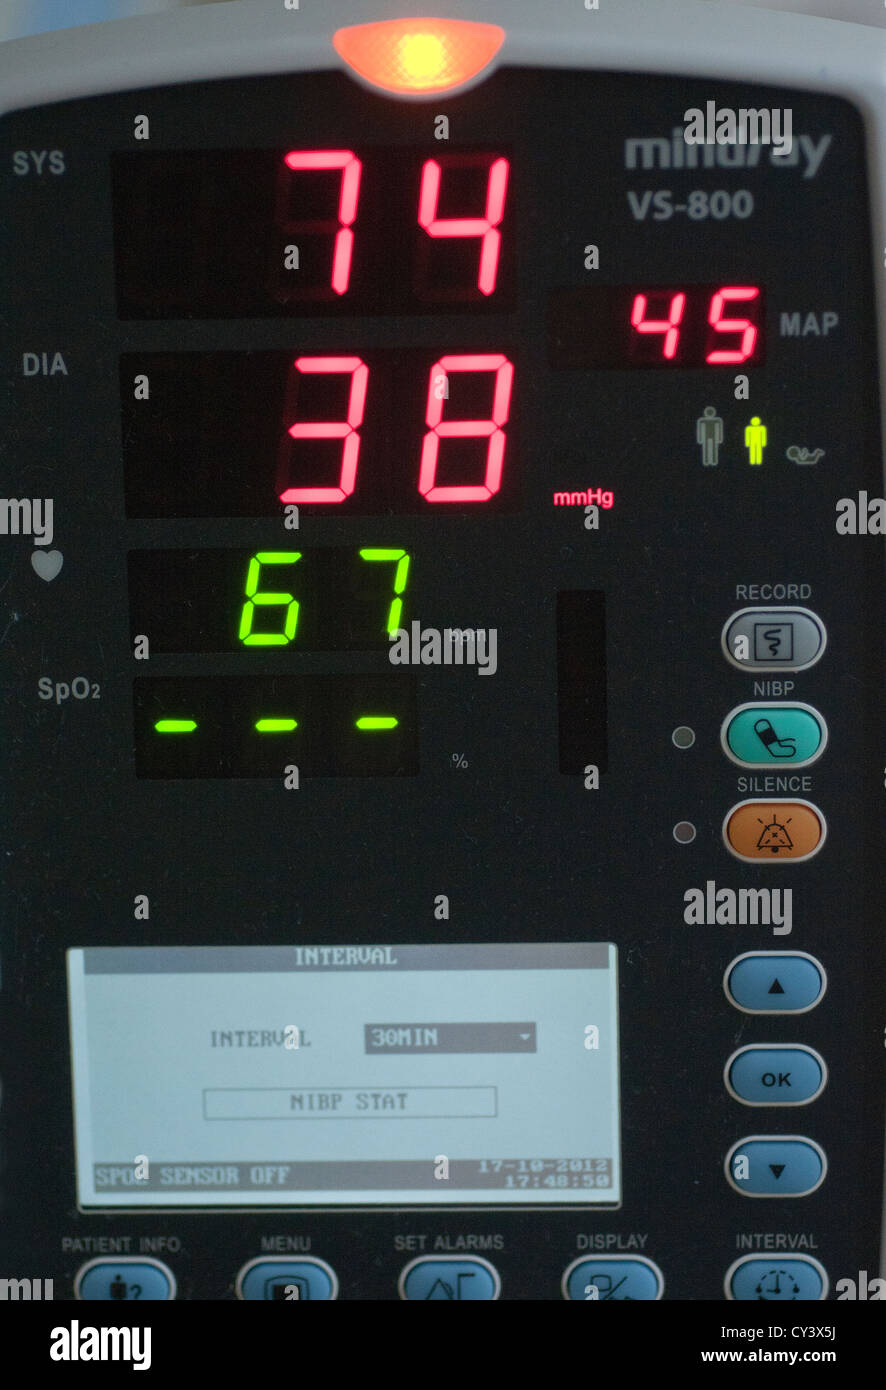 mindray hospital monitor,VS-800 is a compact, easy-to-use vital